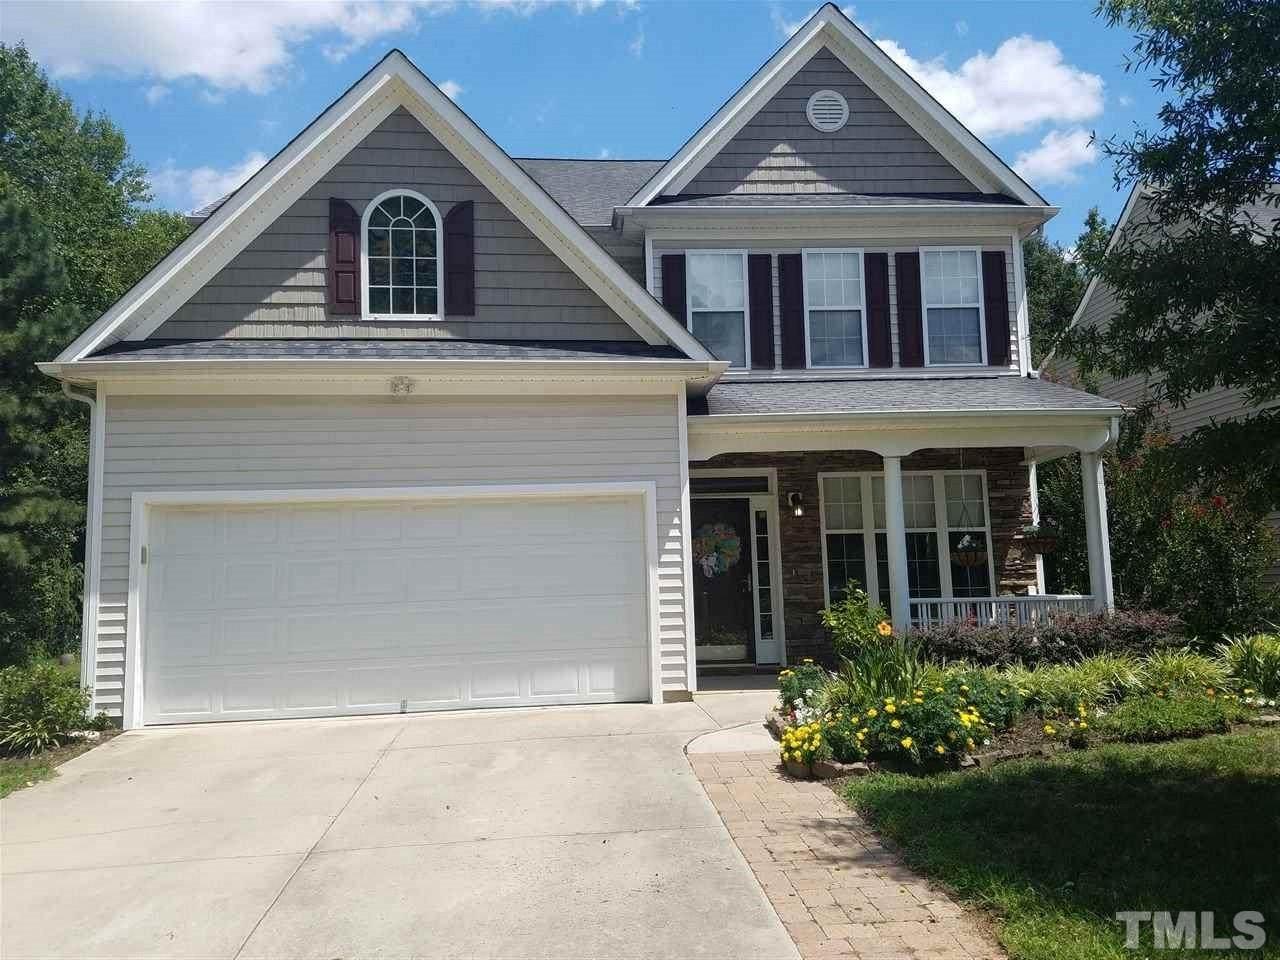 8214 Willowglen Drive - Photo 1